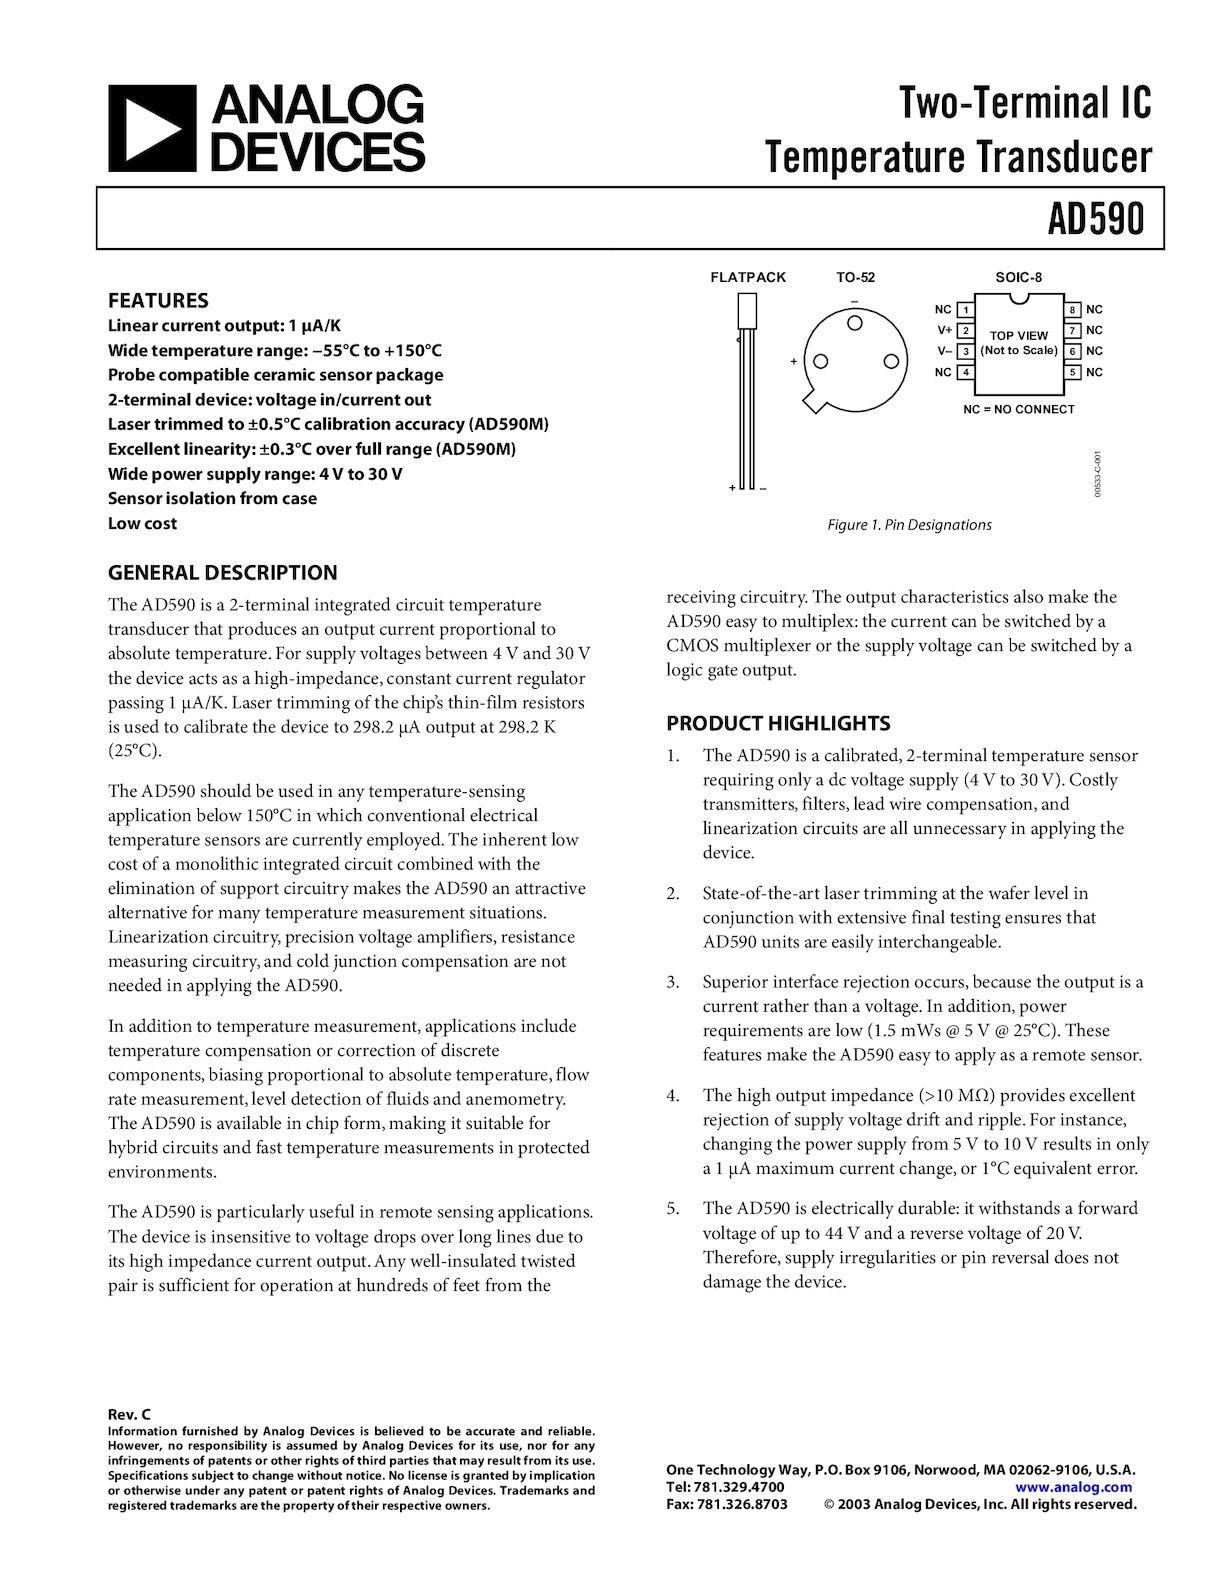 Calamo Trasduttore Di Temperatura Figure 3 Temperature Sensor Schematic